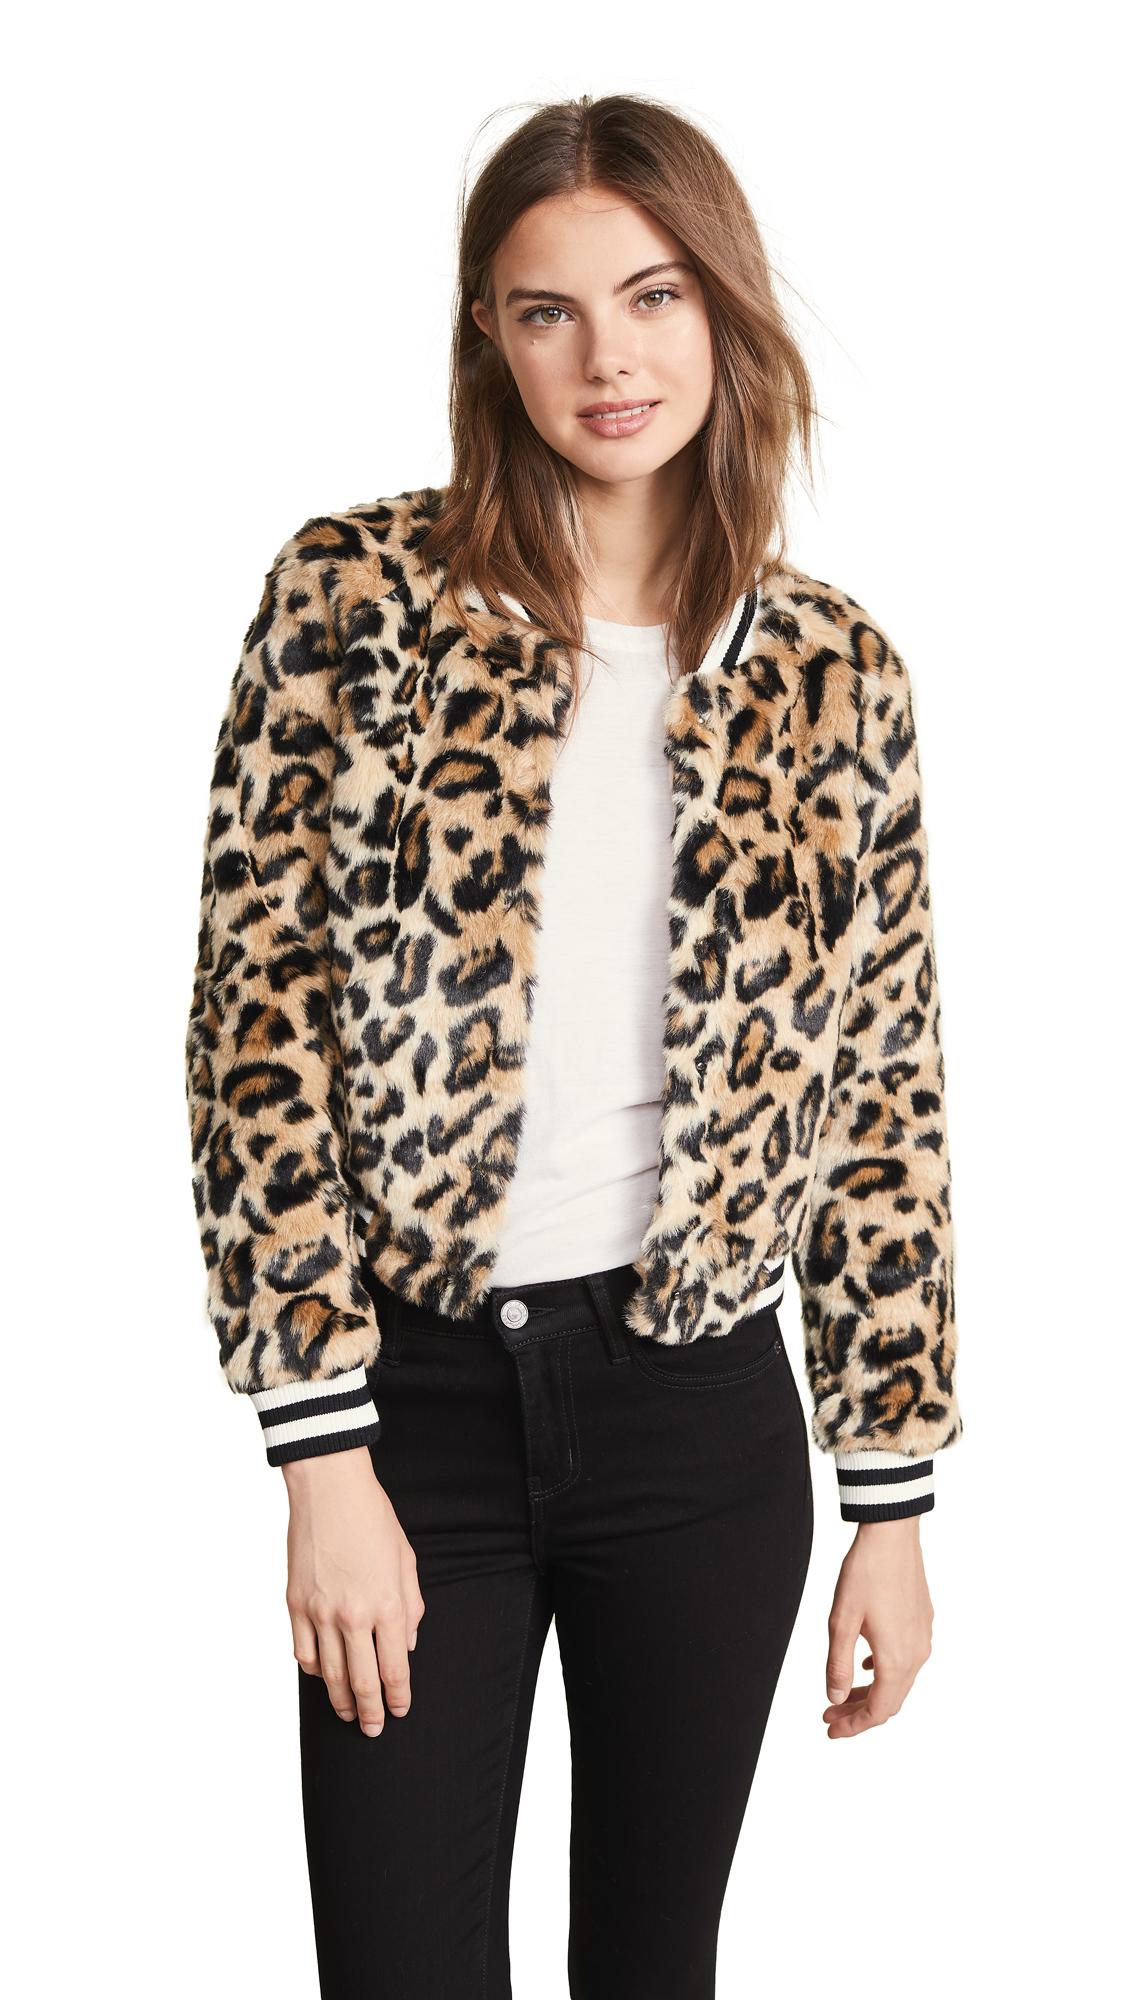 5a3264fcab18 BB Dakota Jack by BB Dakota Clever Girl Leopard Faux Fur Bomber ...